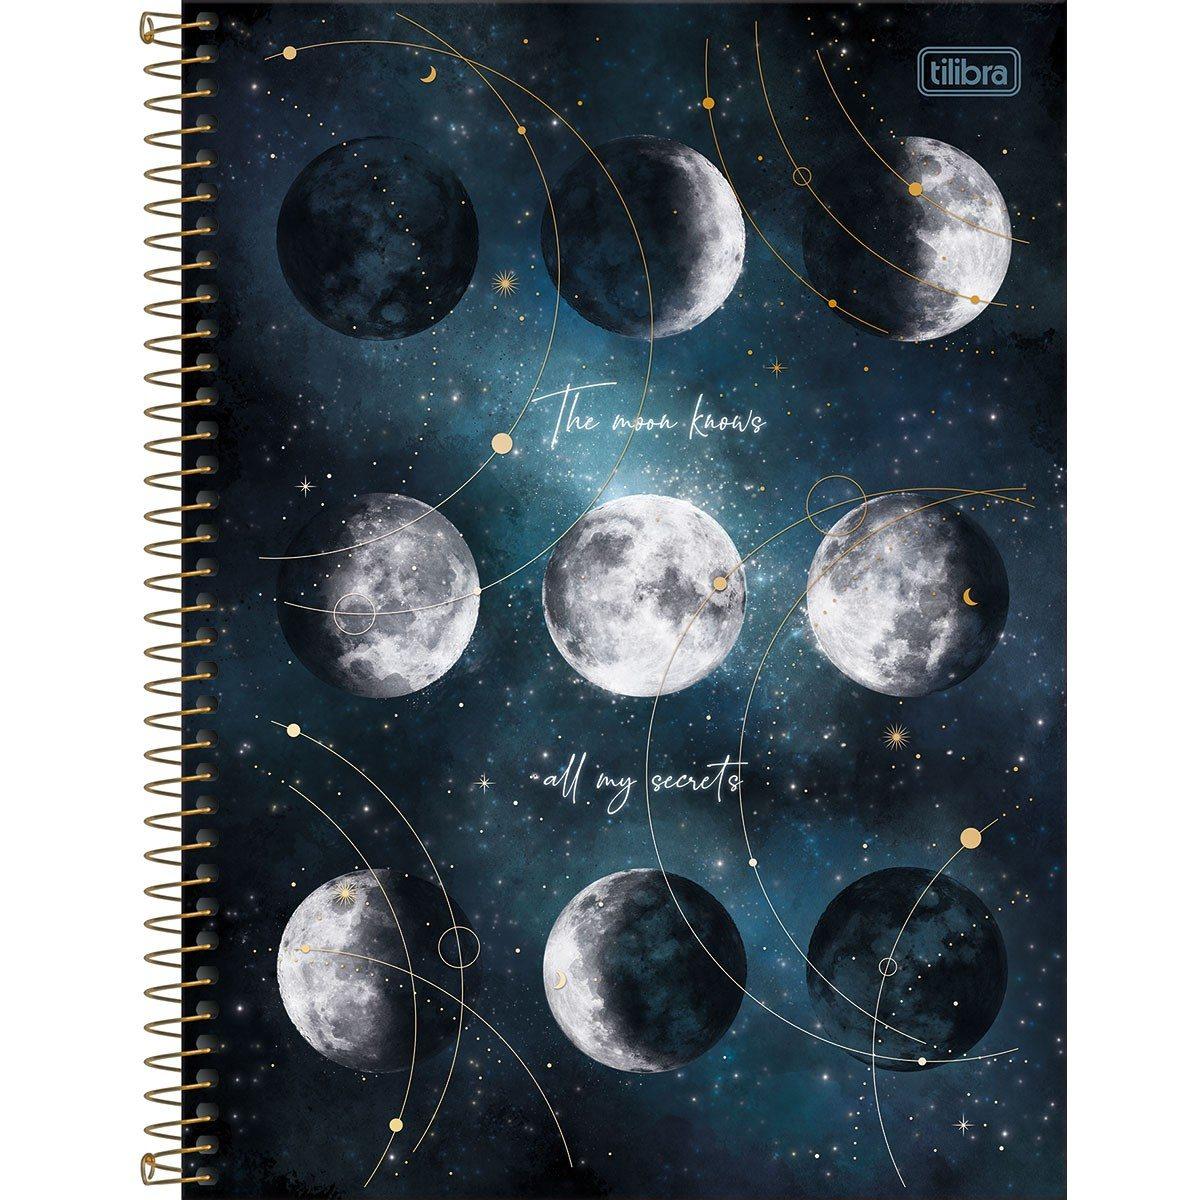 Caderno Espiral CD Colegial 10 Matérias Magic 160 Fls - Tilibra